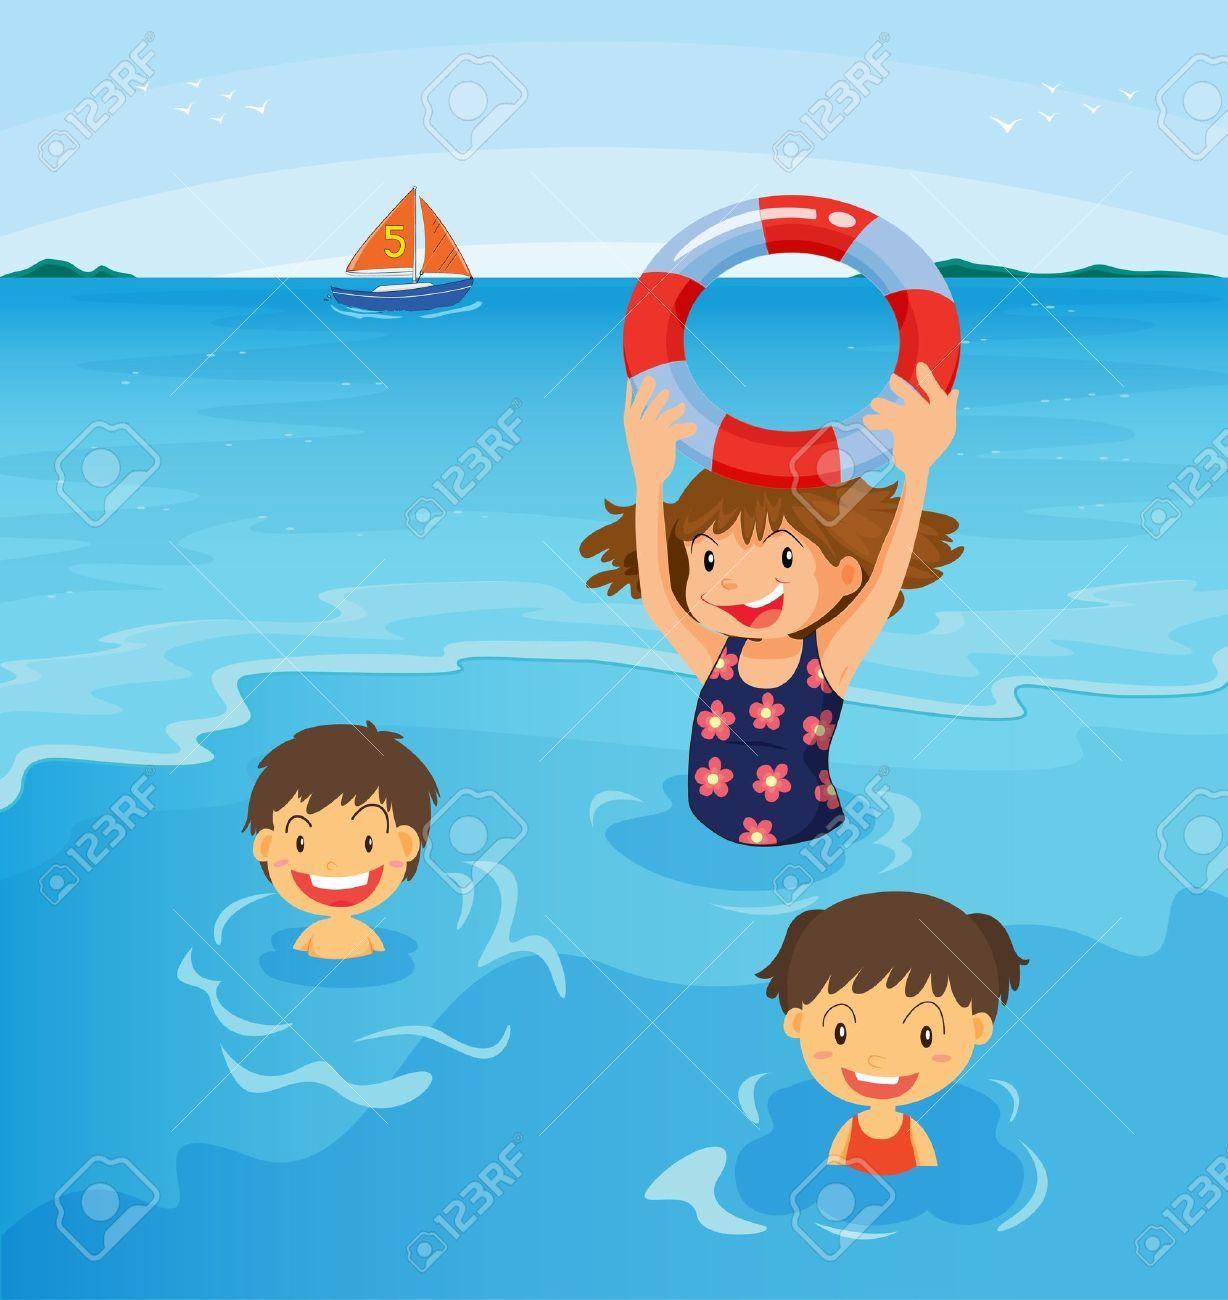 Children swimming at the beach clipart 5 » Clipart Portal.